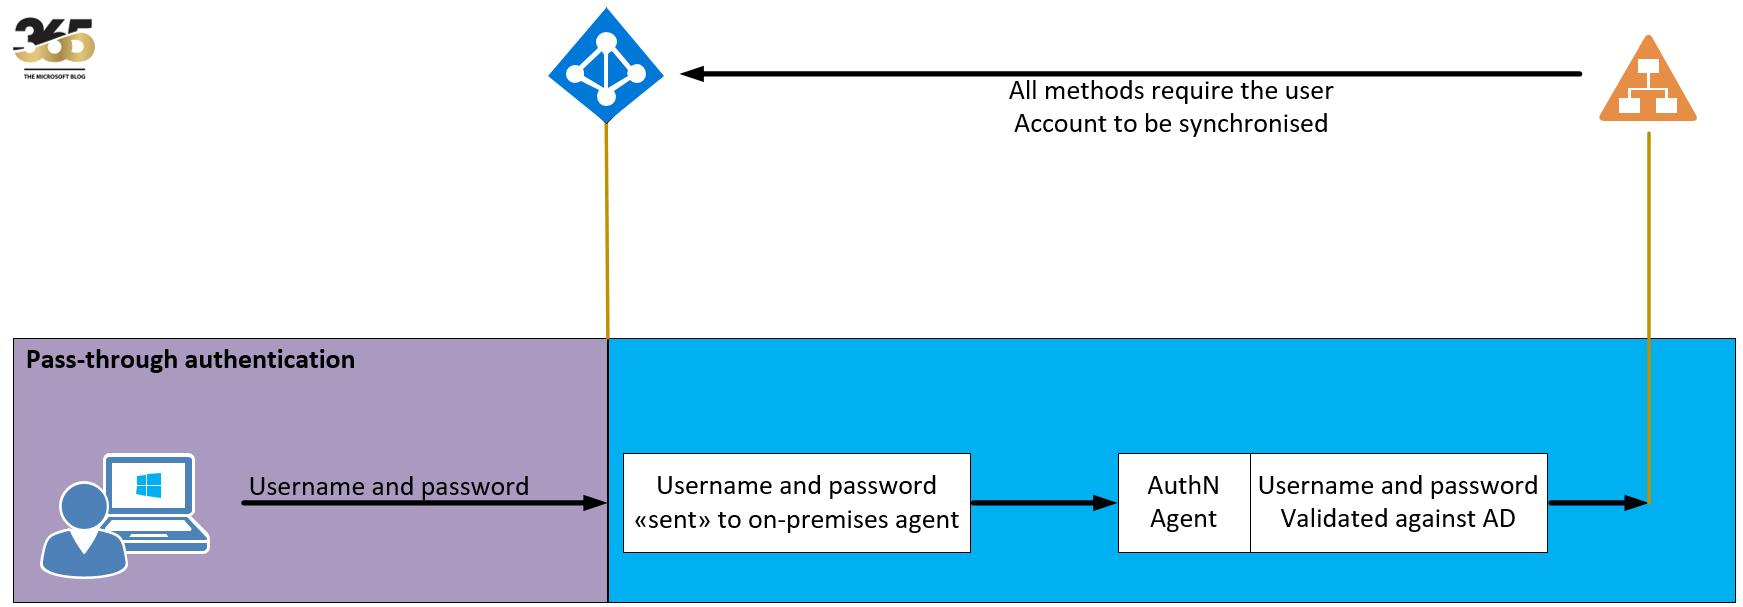 Azure Active Directory Pass-through Authentication   MSB365